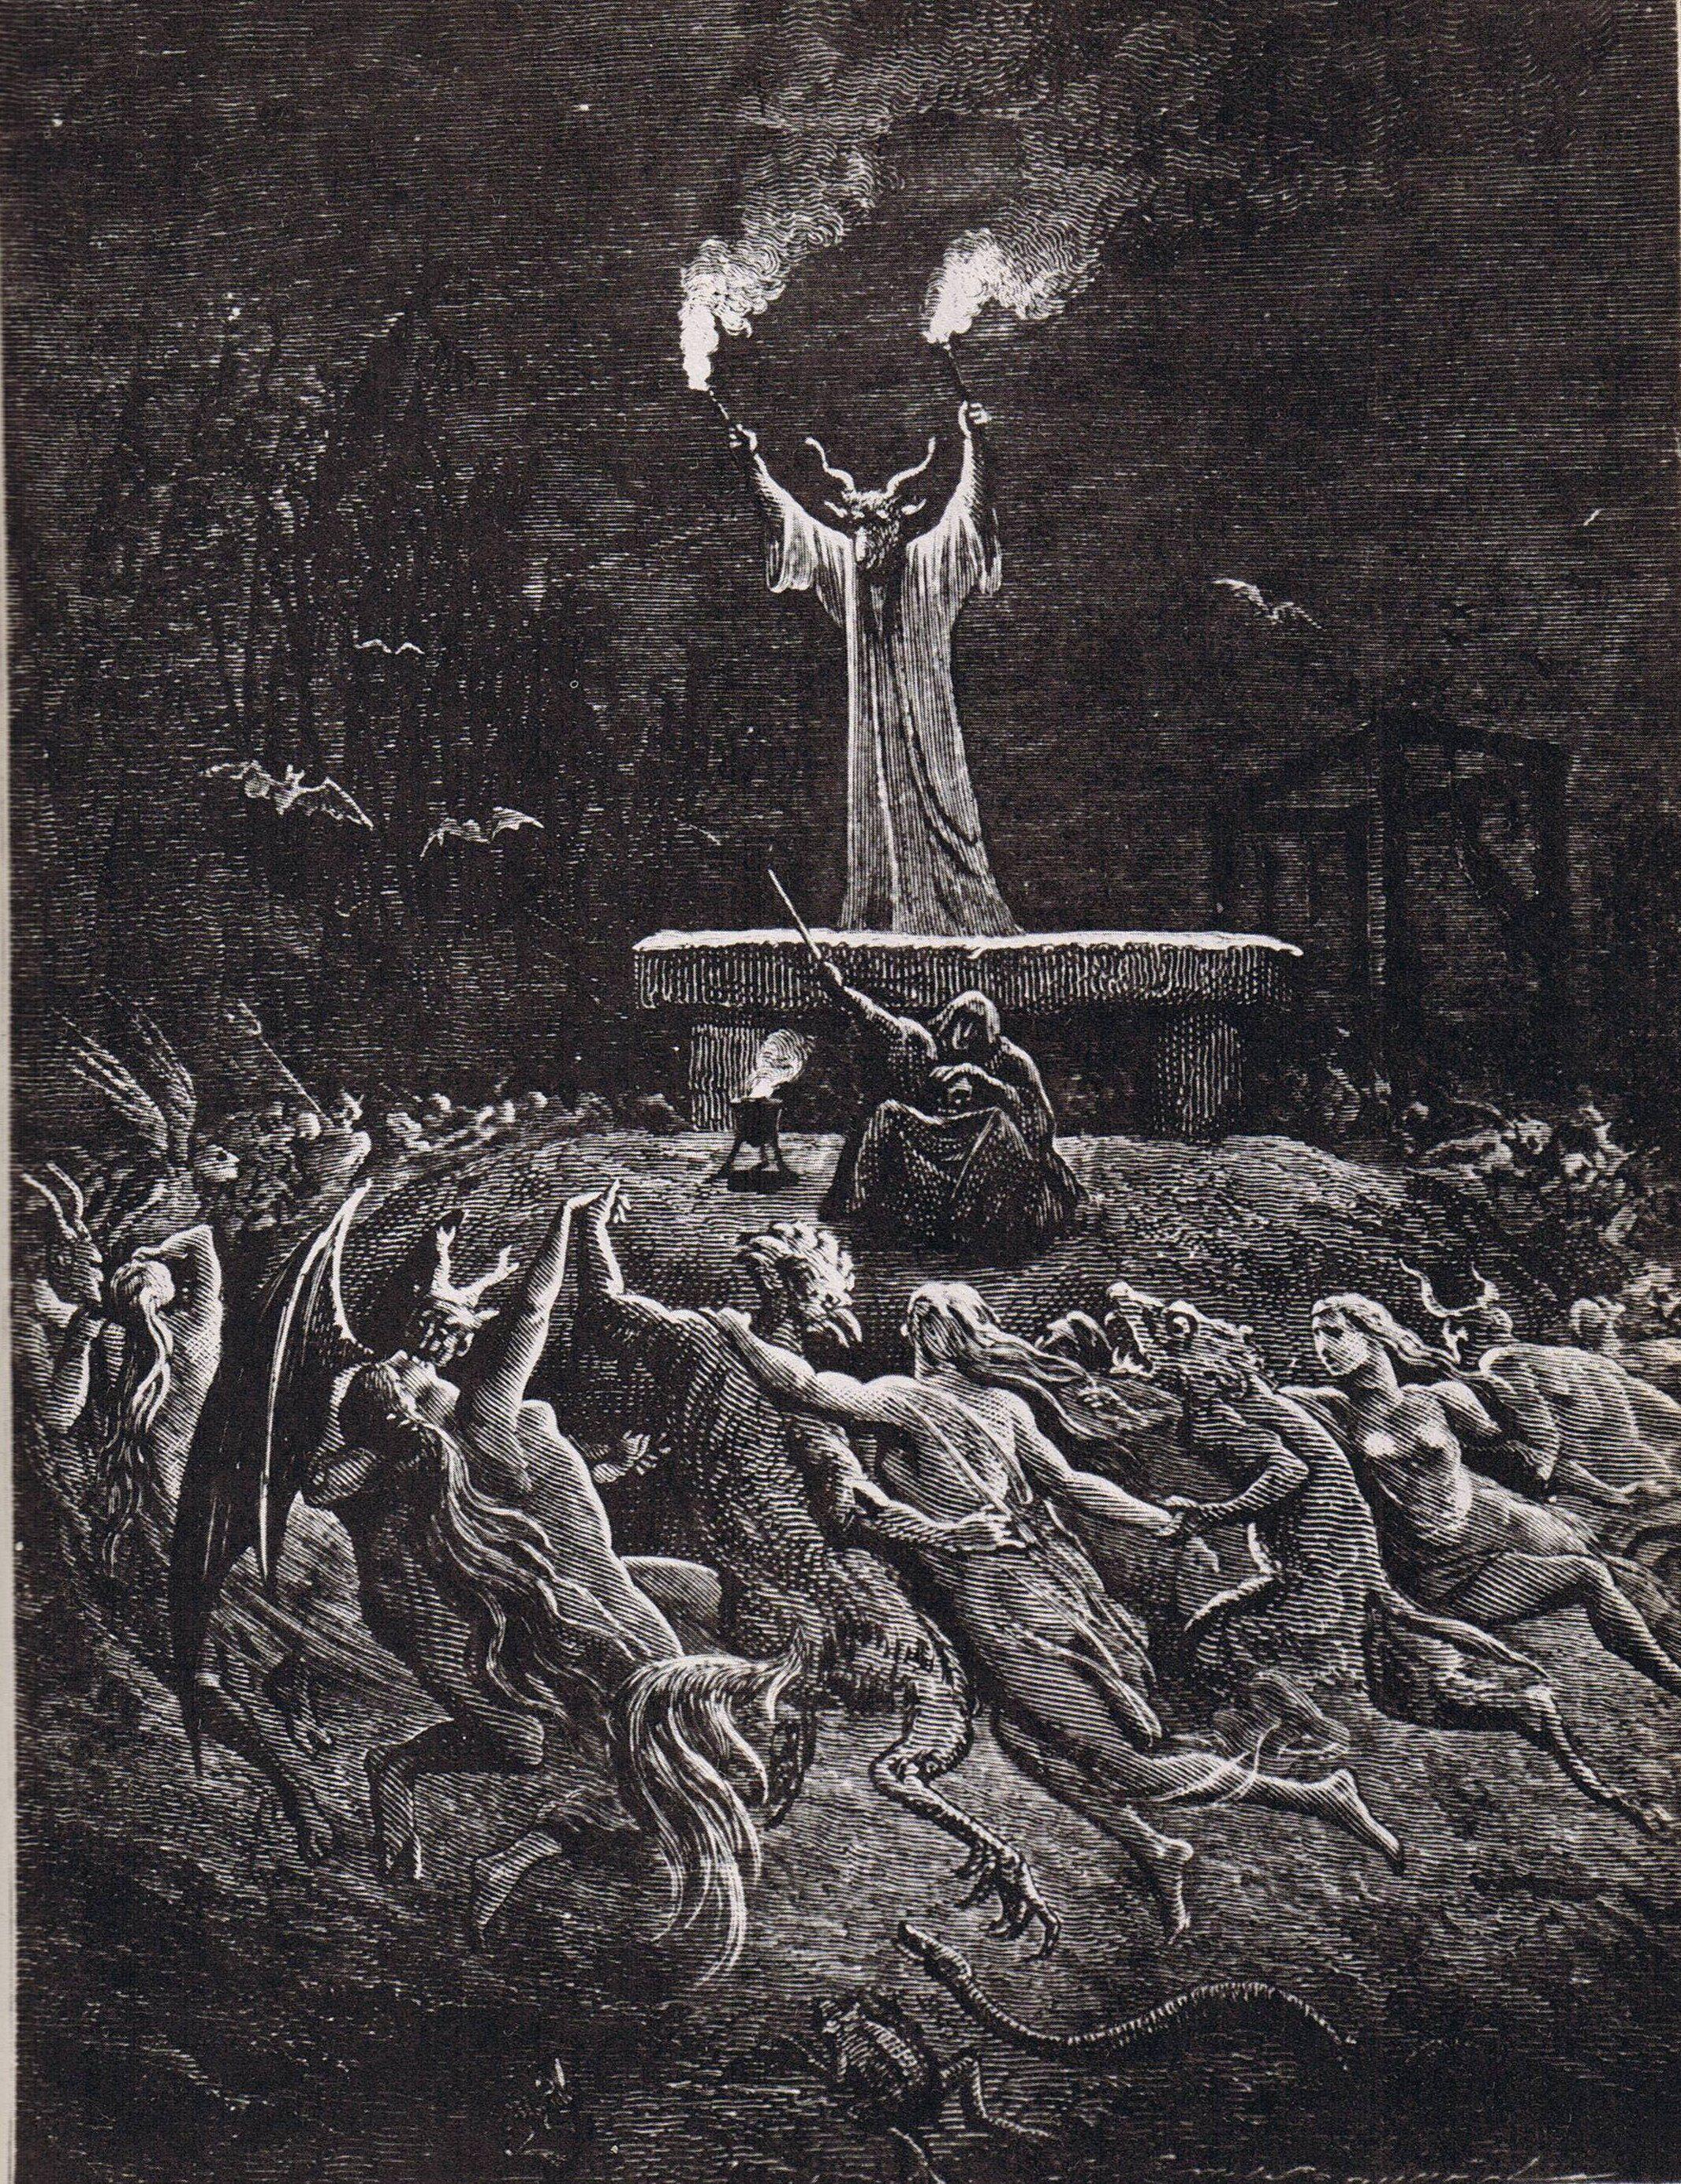 Pin by Joanne Lieser on Art ♥ | Satanic art, Gustave dore, Occult art